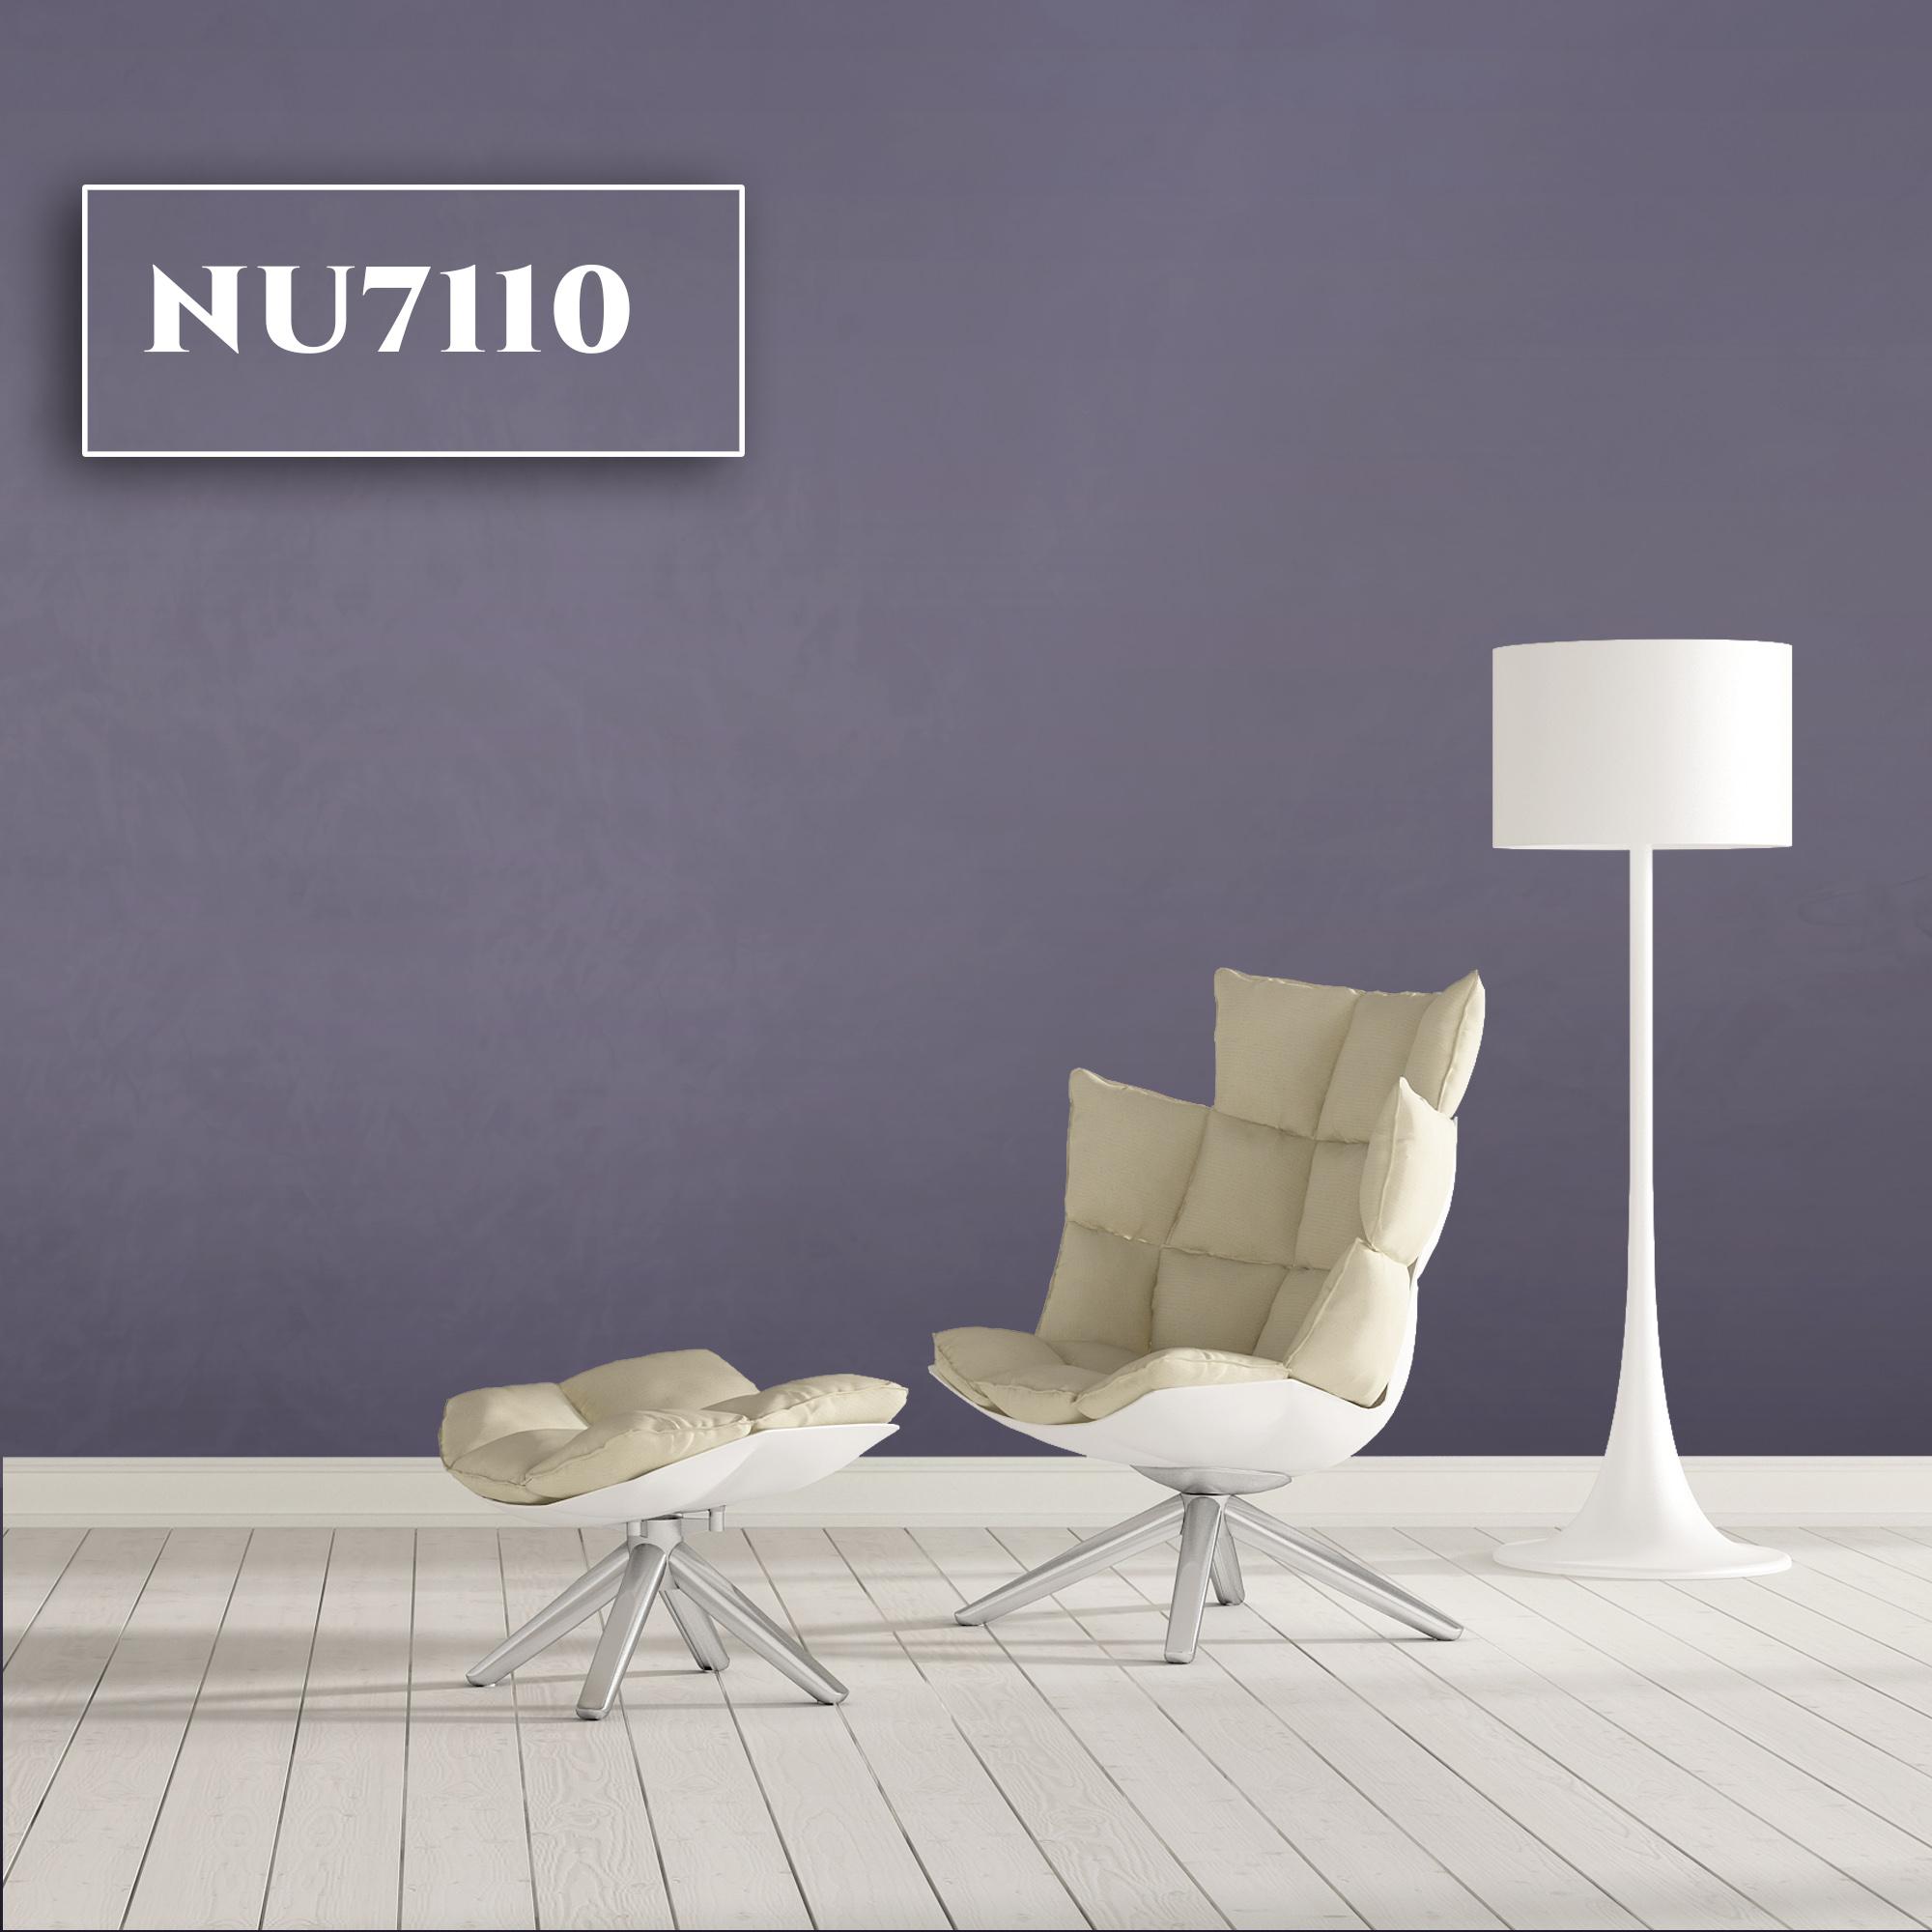 NU7110